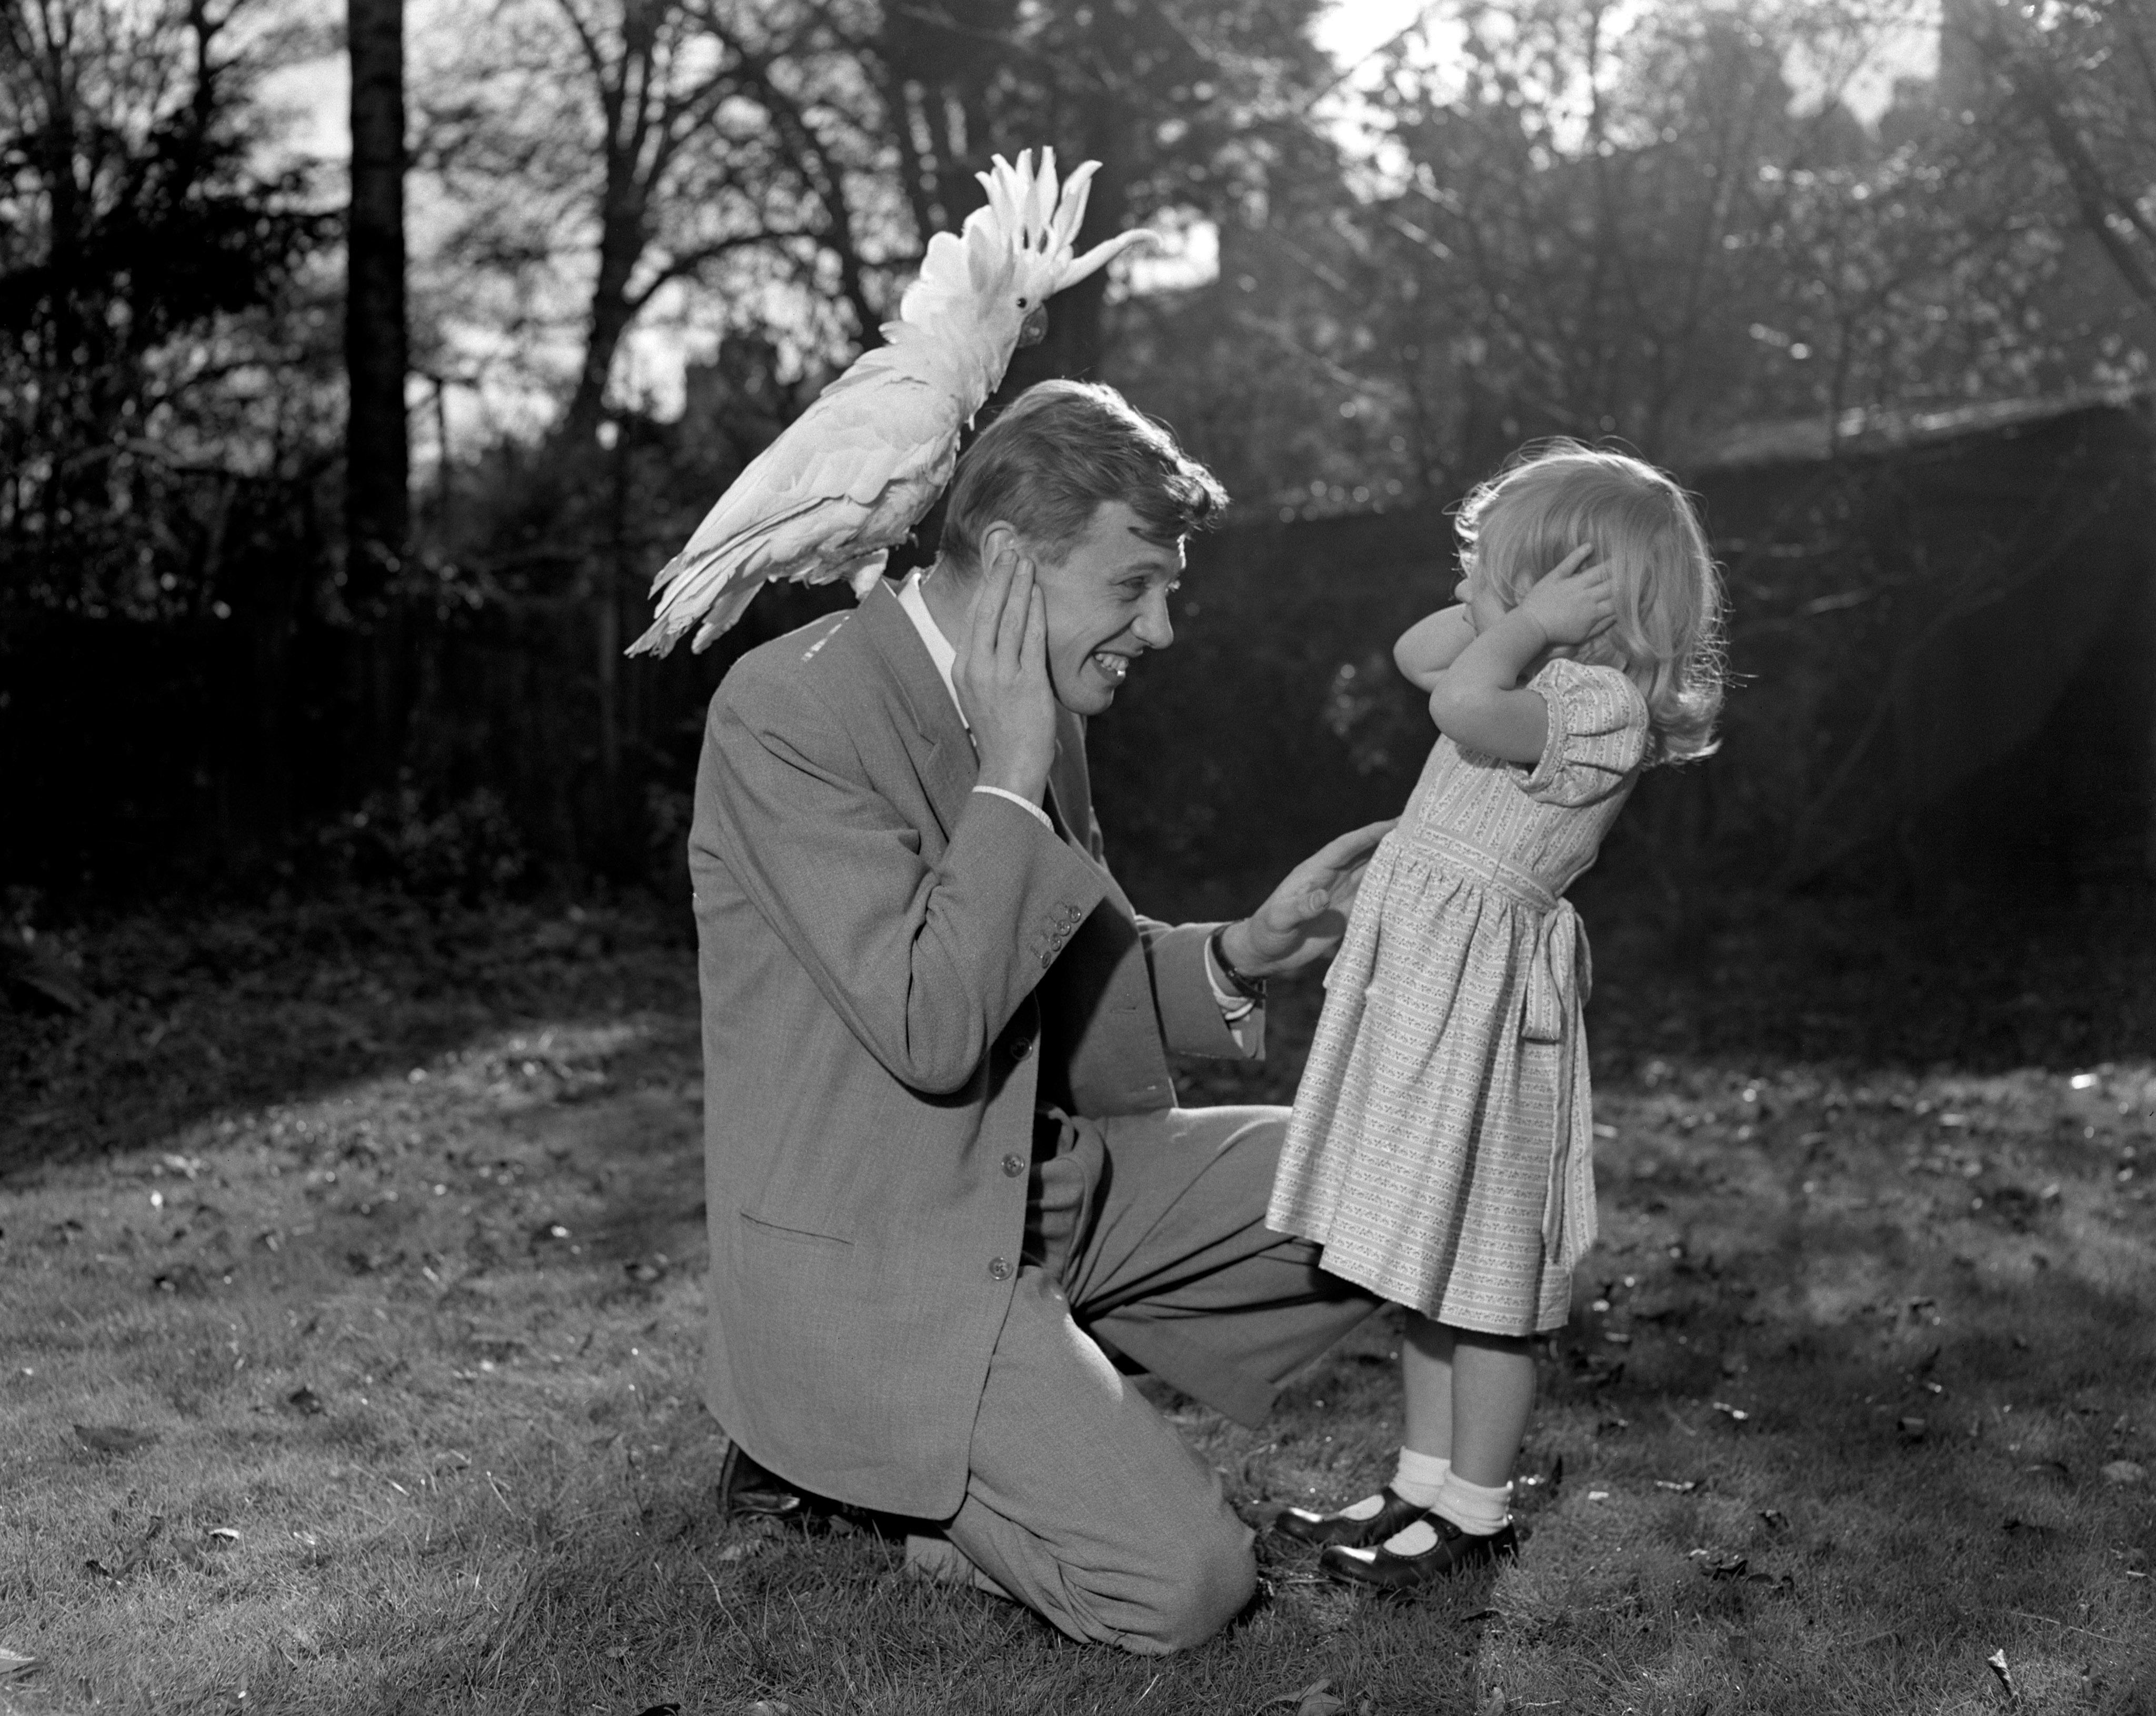 Sir David in 1957. Credit: PA